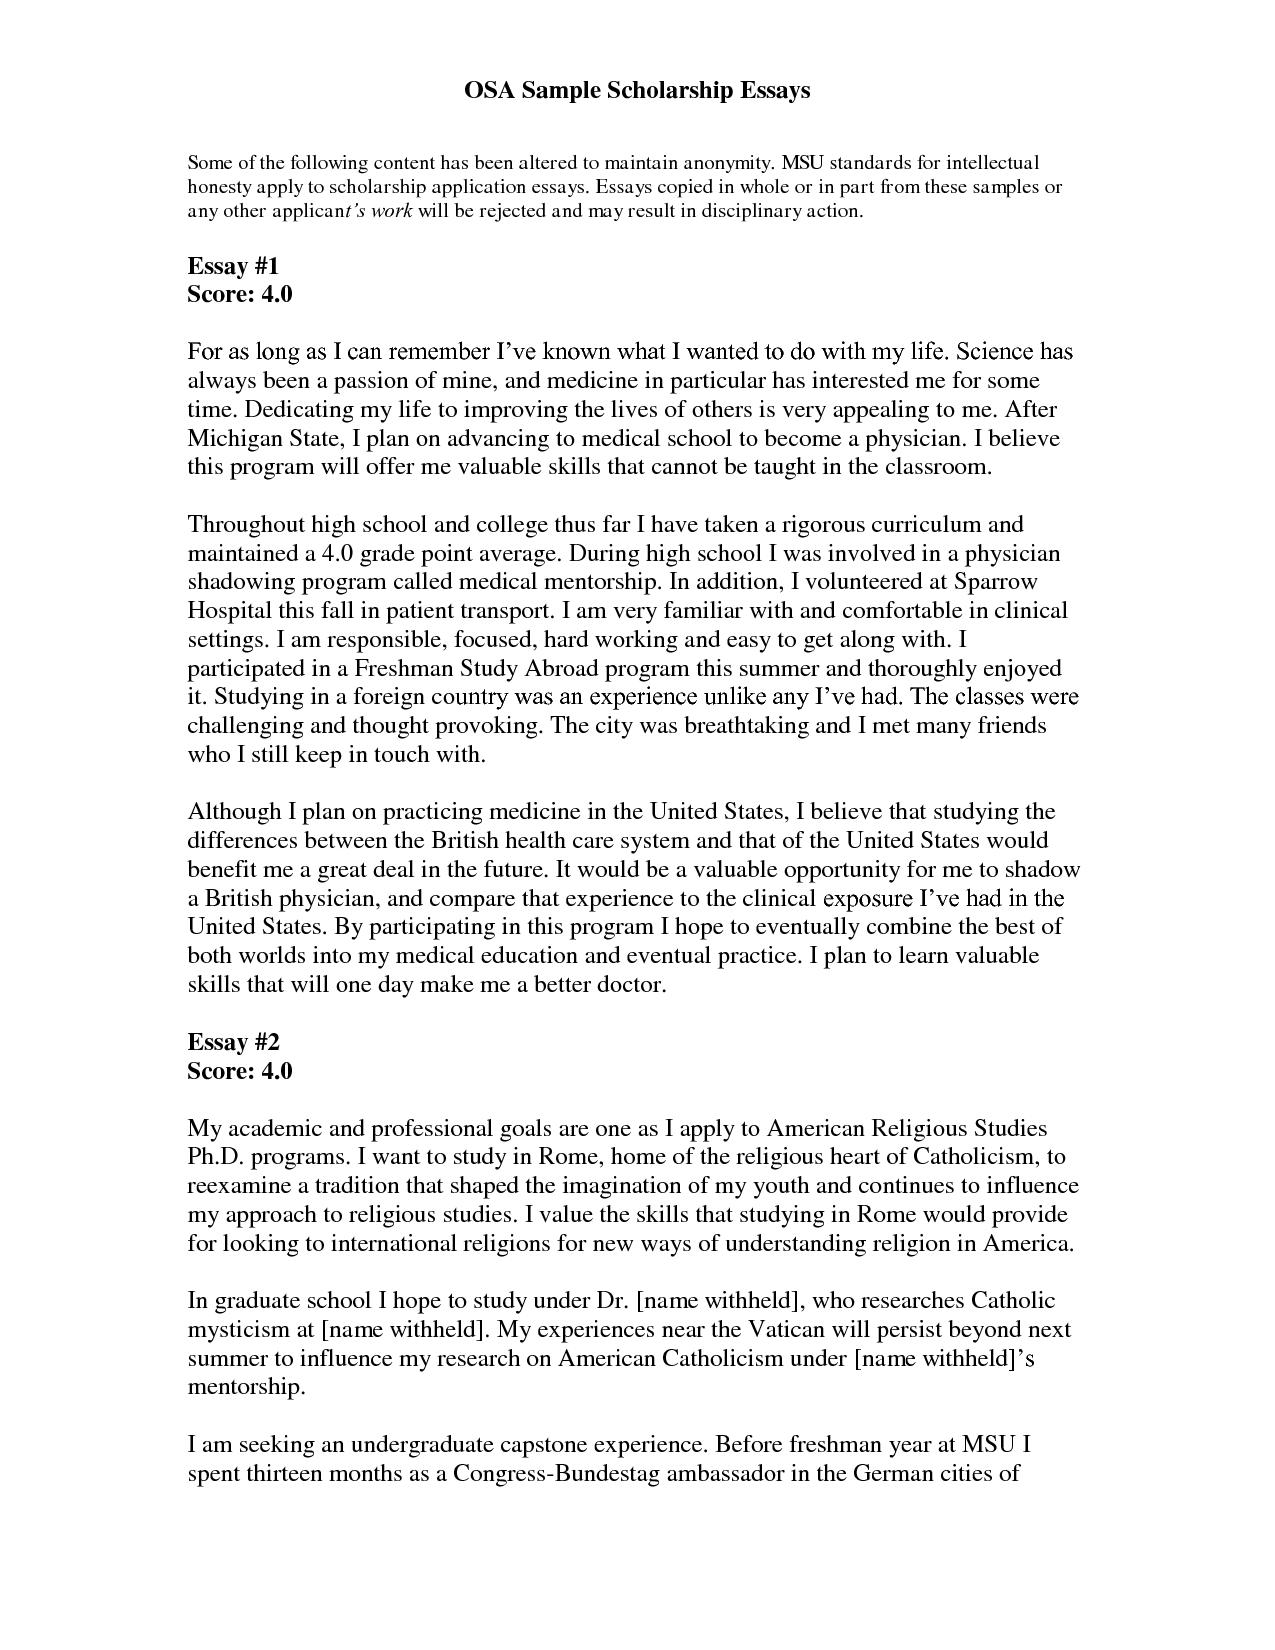 008 Ynt0sledfv Sample Essay For Scholarship Incredible Mara Personal Pdf Full